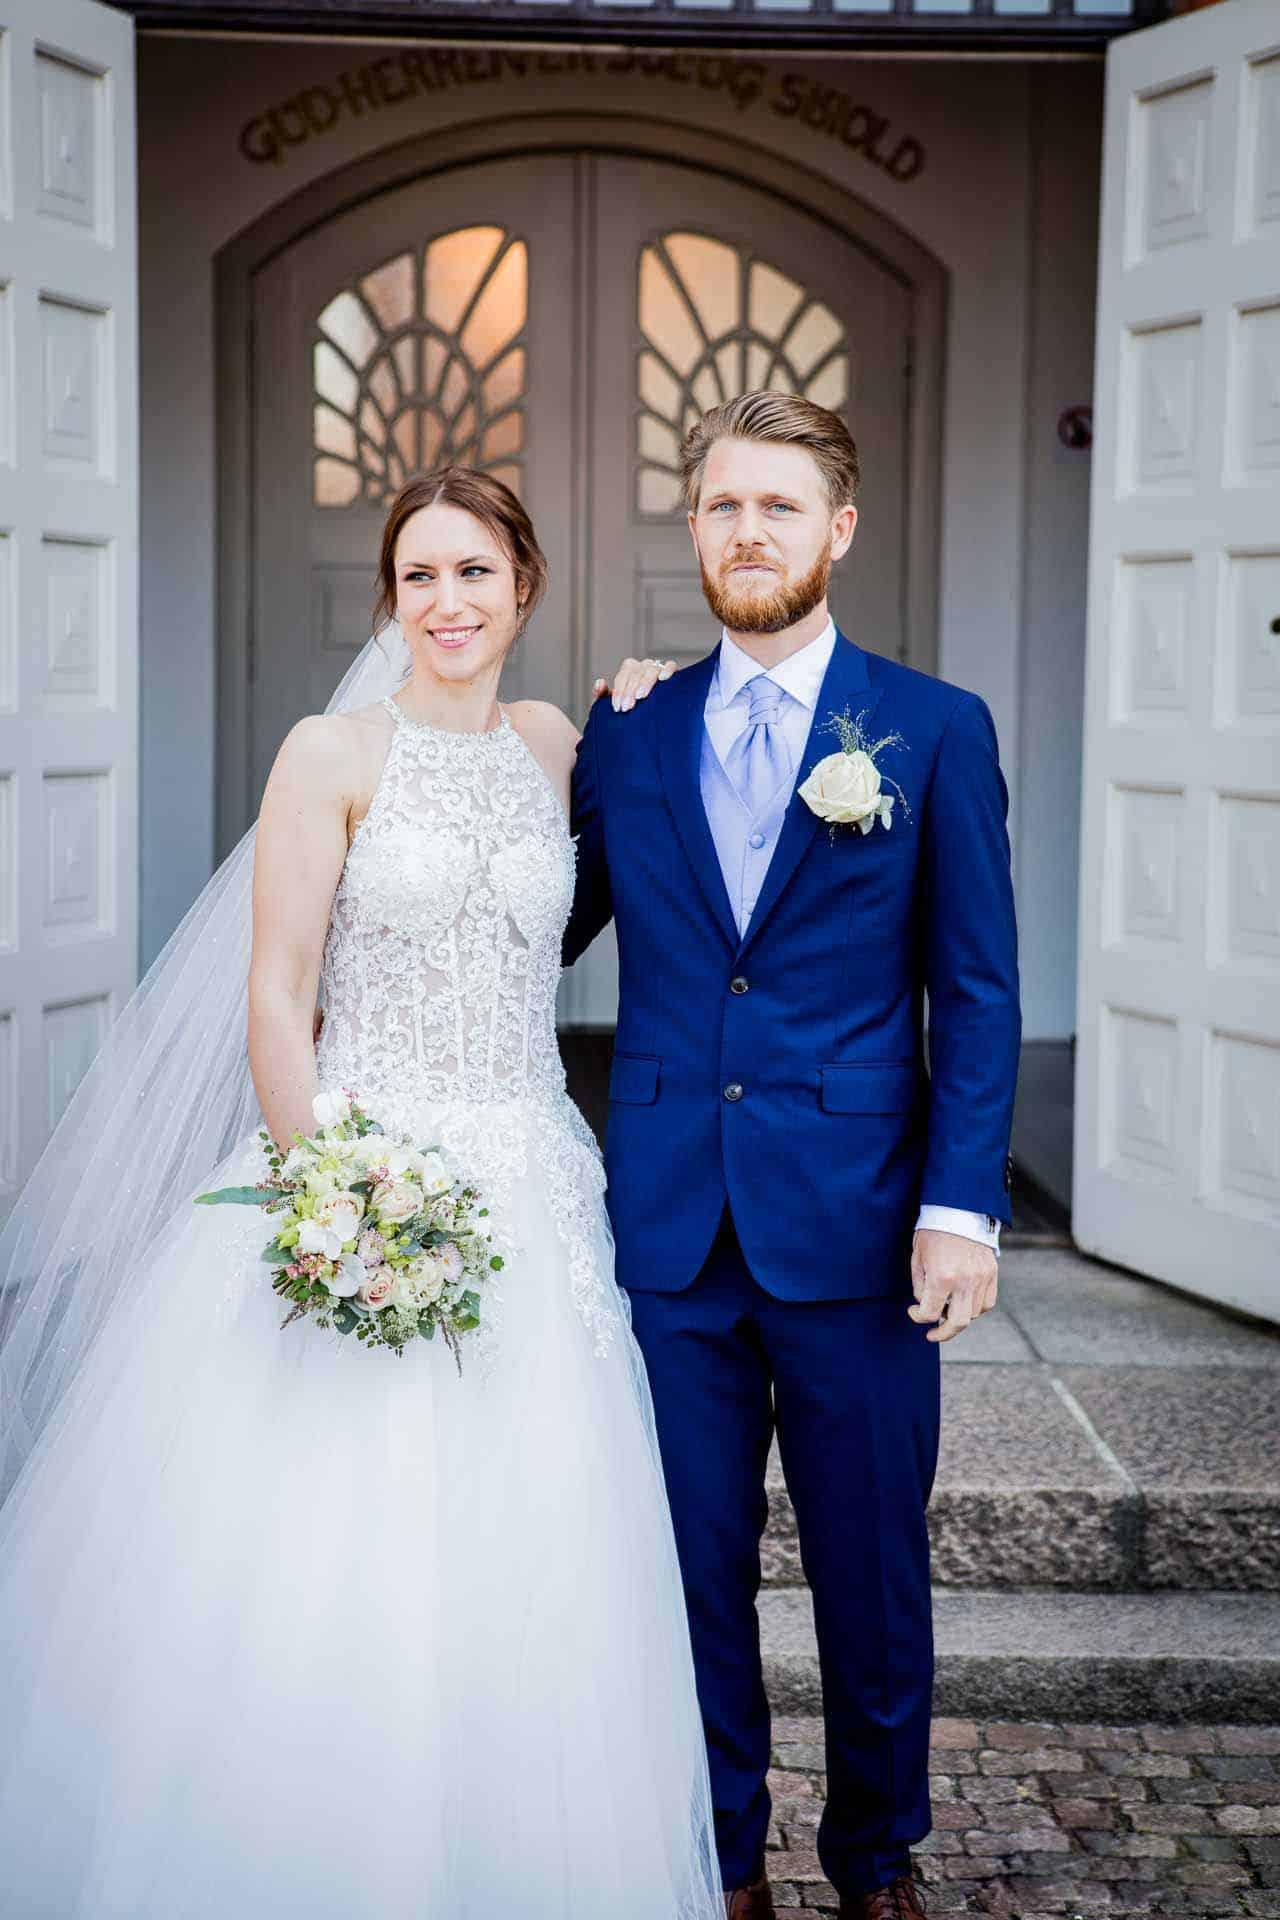 Bryllup Esbjerg | Hold bryllupsfest